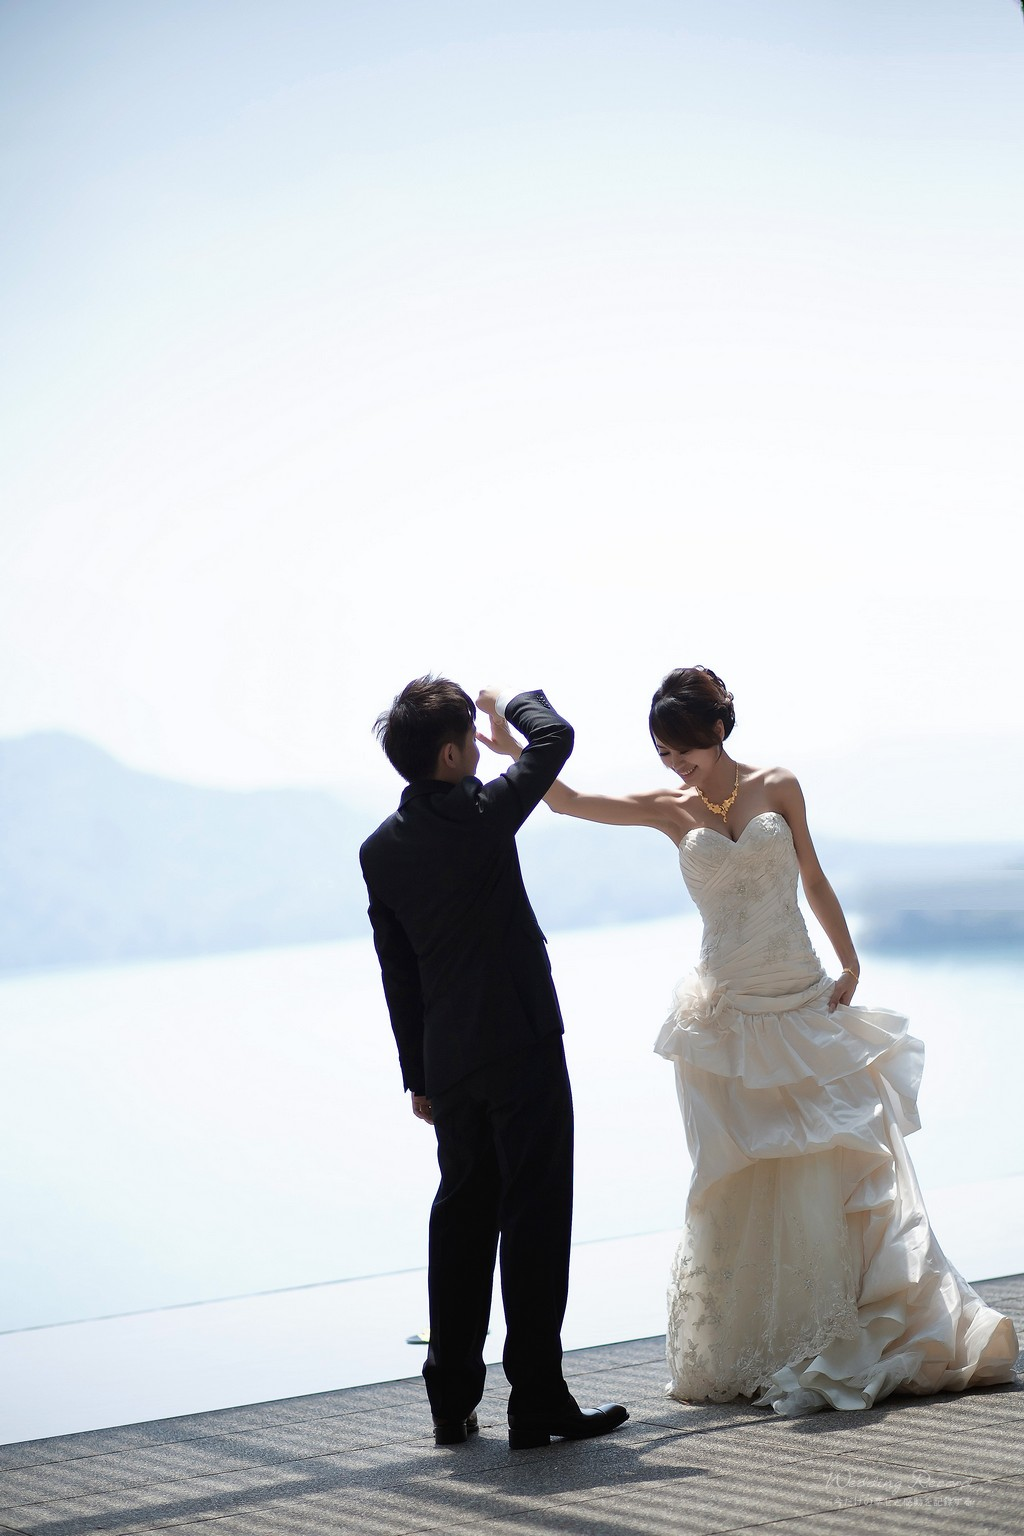 7075353011_b1d8ce53e3_o-法豆影像工作室_婚攝, 婚禮攝影, 婚禮紀錄, 婚紗攝影, 自助婚紗, 婚攝推薦, 攝影棚出租, 攝影棚租借, 孕婦禮服出租, 孕婦禮服租借, CEO專業形象照, 形像照, 型像照, 型象照. 形象照團拍, 全家福, 全家福團拍, 招團, 揪團拍, 親子寫真, 家庭寫真, 抓周, 抓周團拍